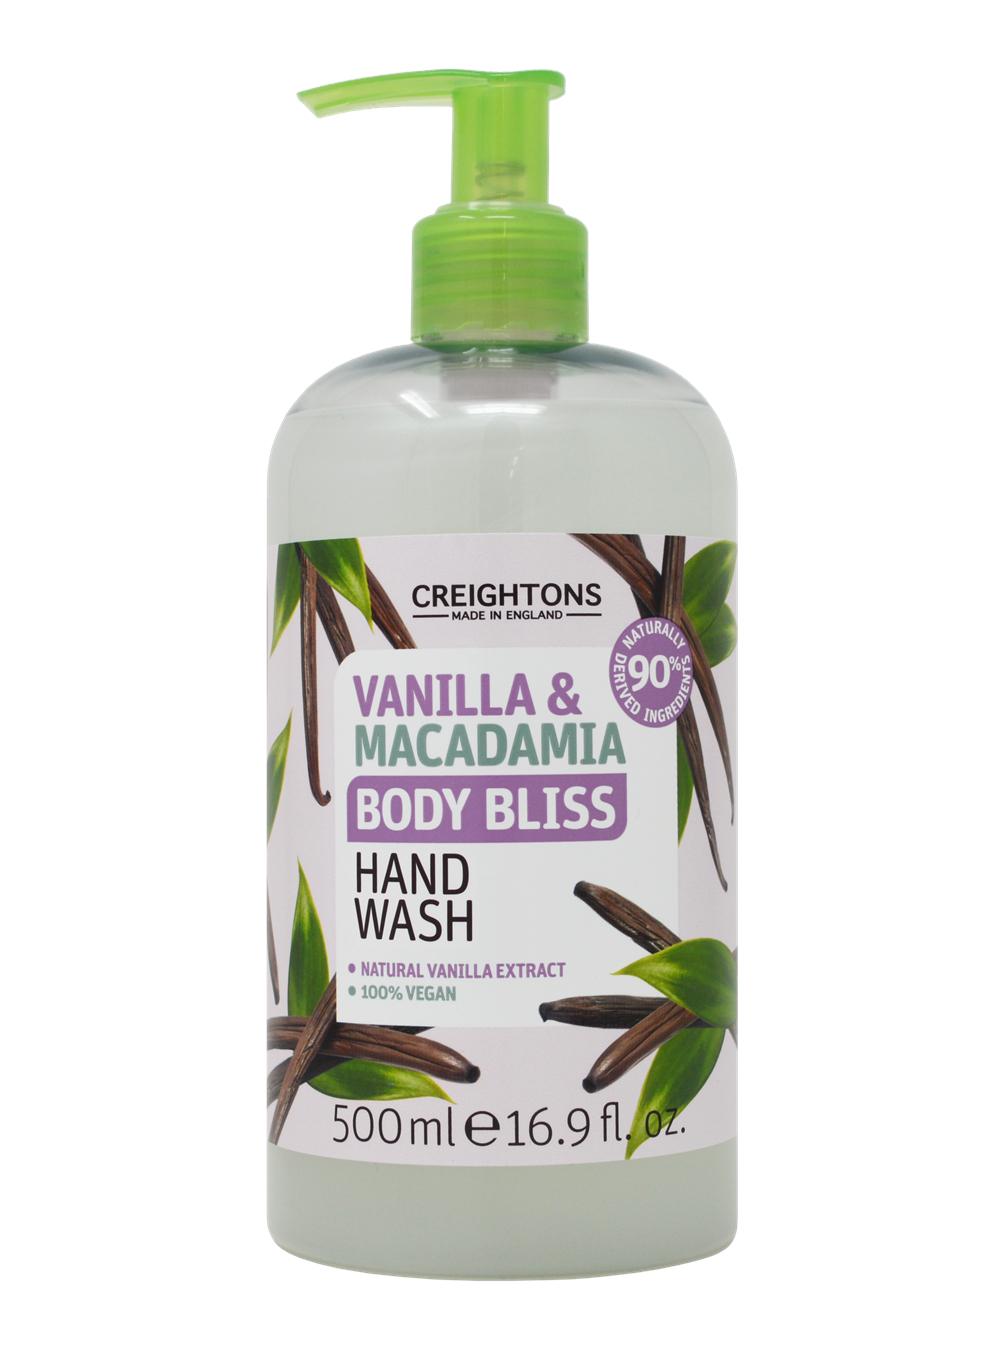 Creightons body bliss vanilla & macadamia hand wash 500ml £1 @ Asda (Chester)